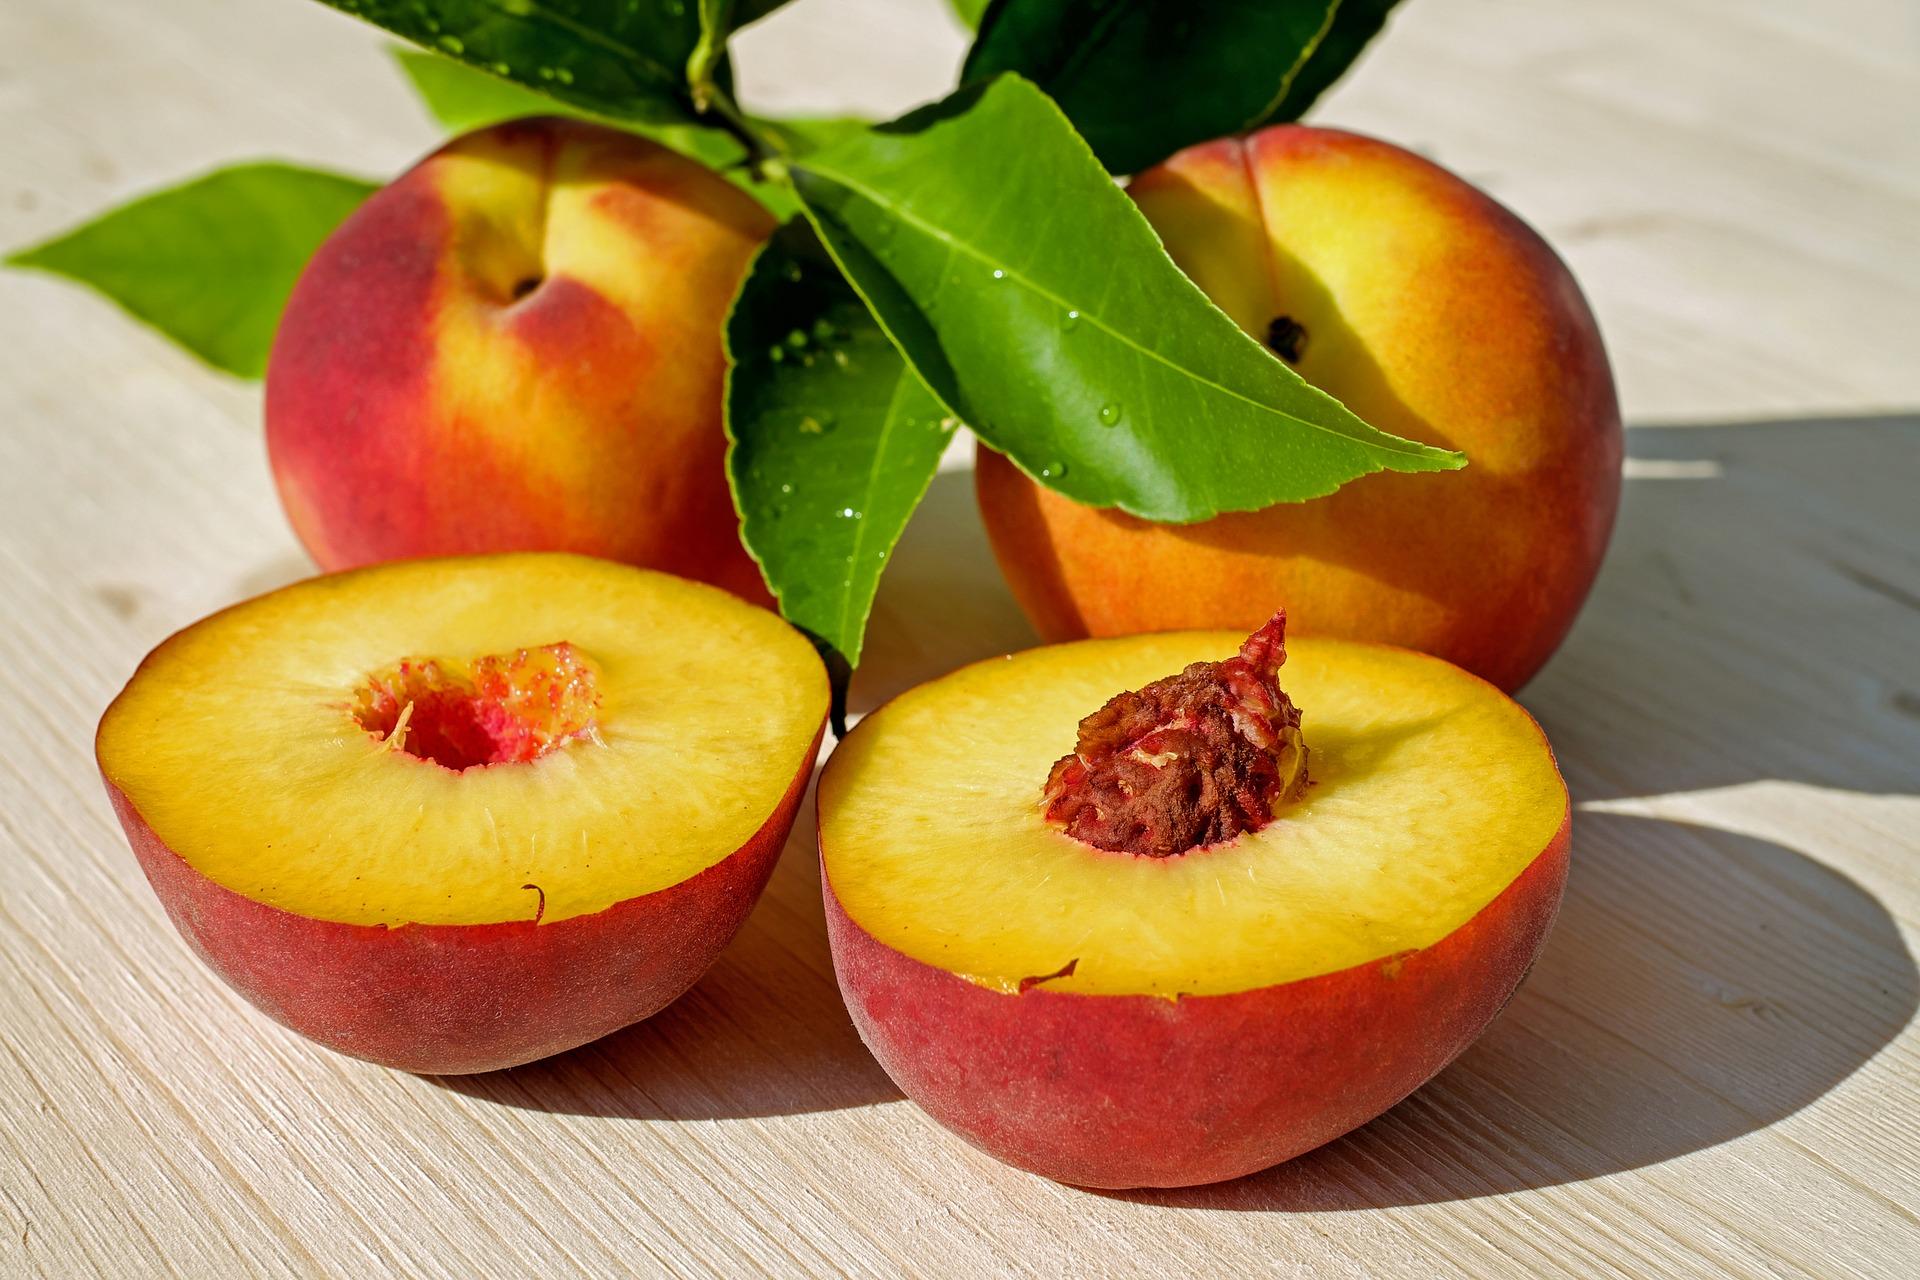 Peach pixabay